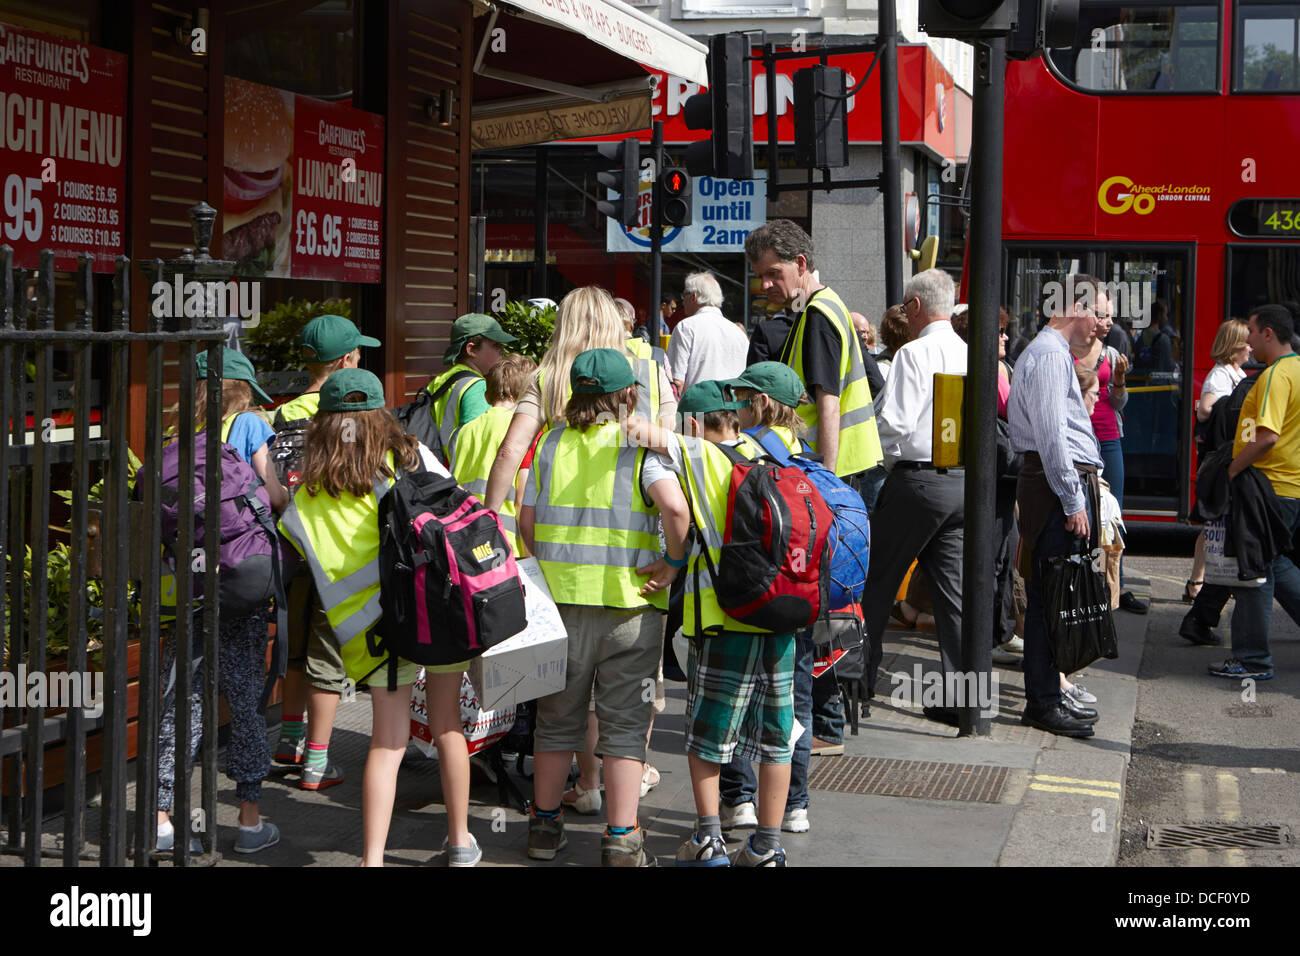 children on school trip to London wearing high vis vests England UK - Stock Image